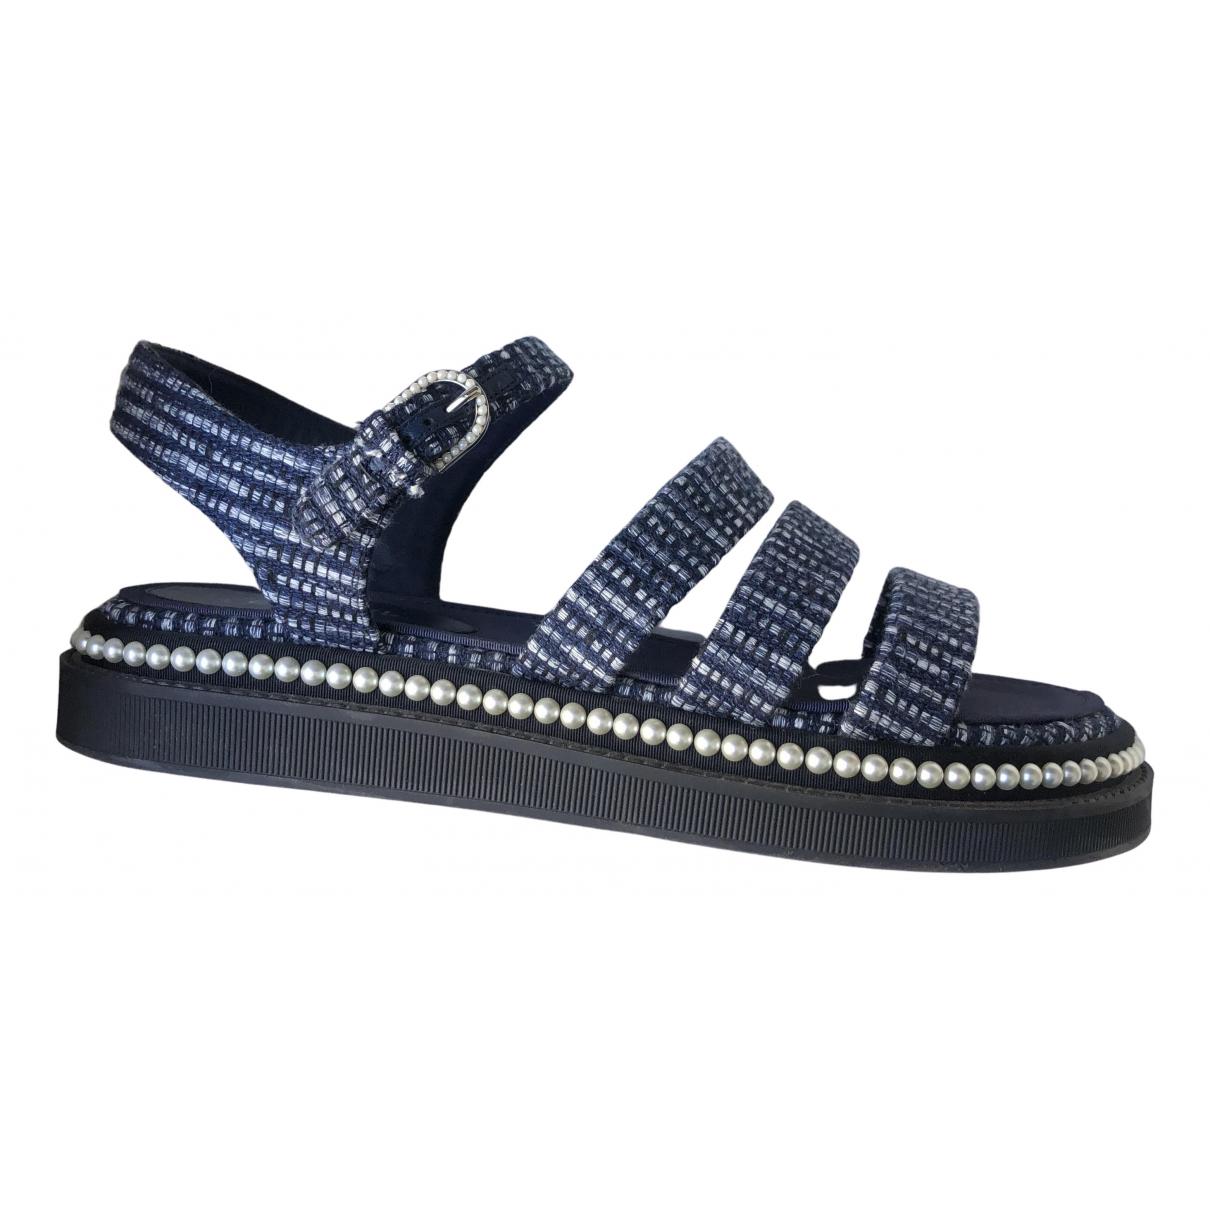 Chanel - Sandales   pour femme en tweed - marine